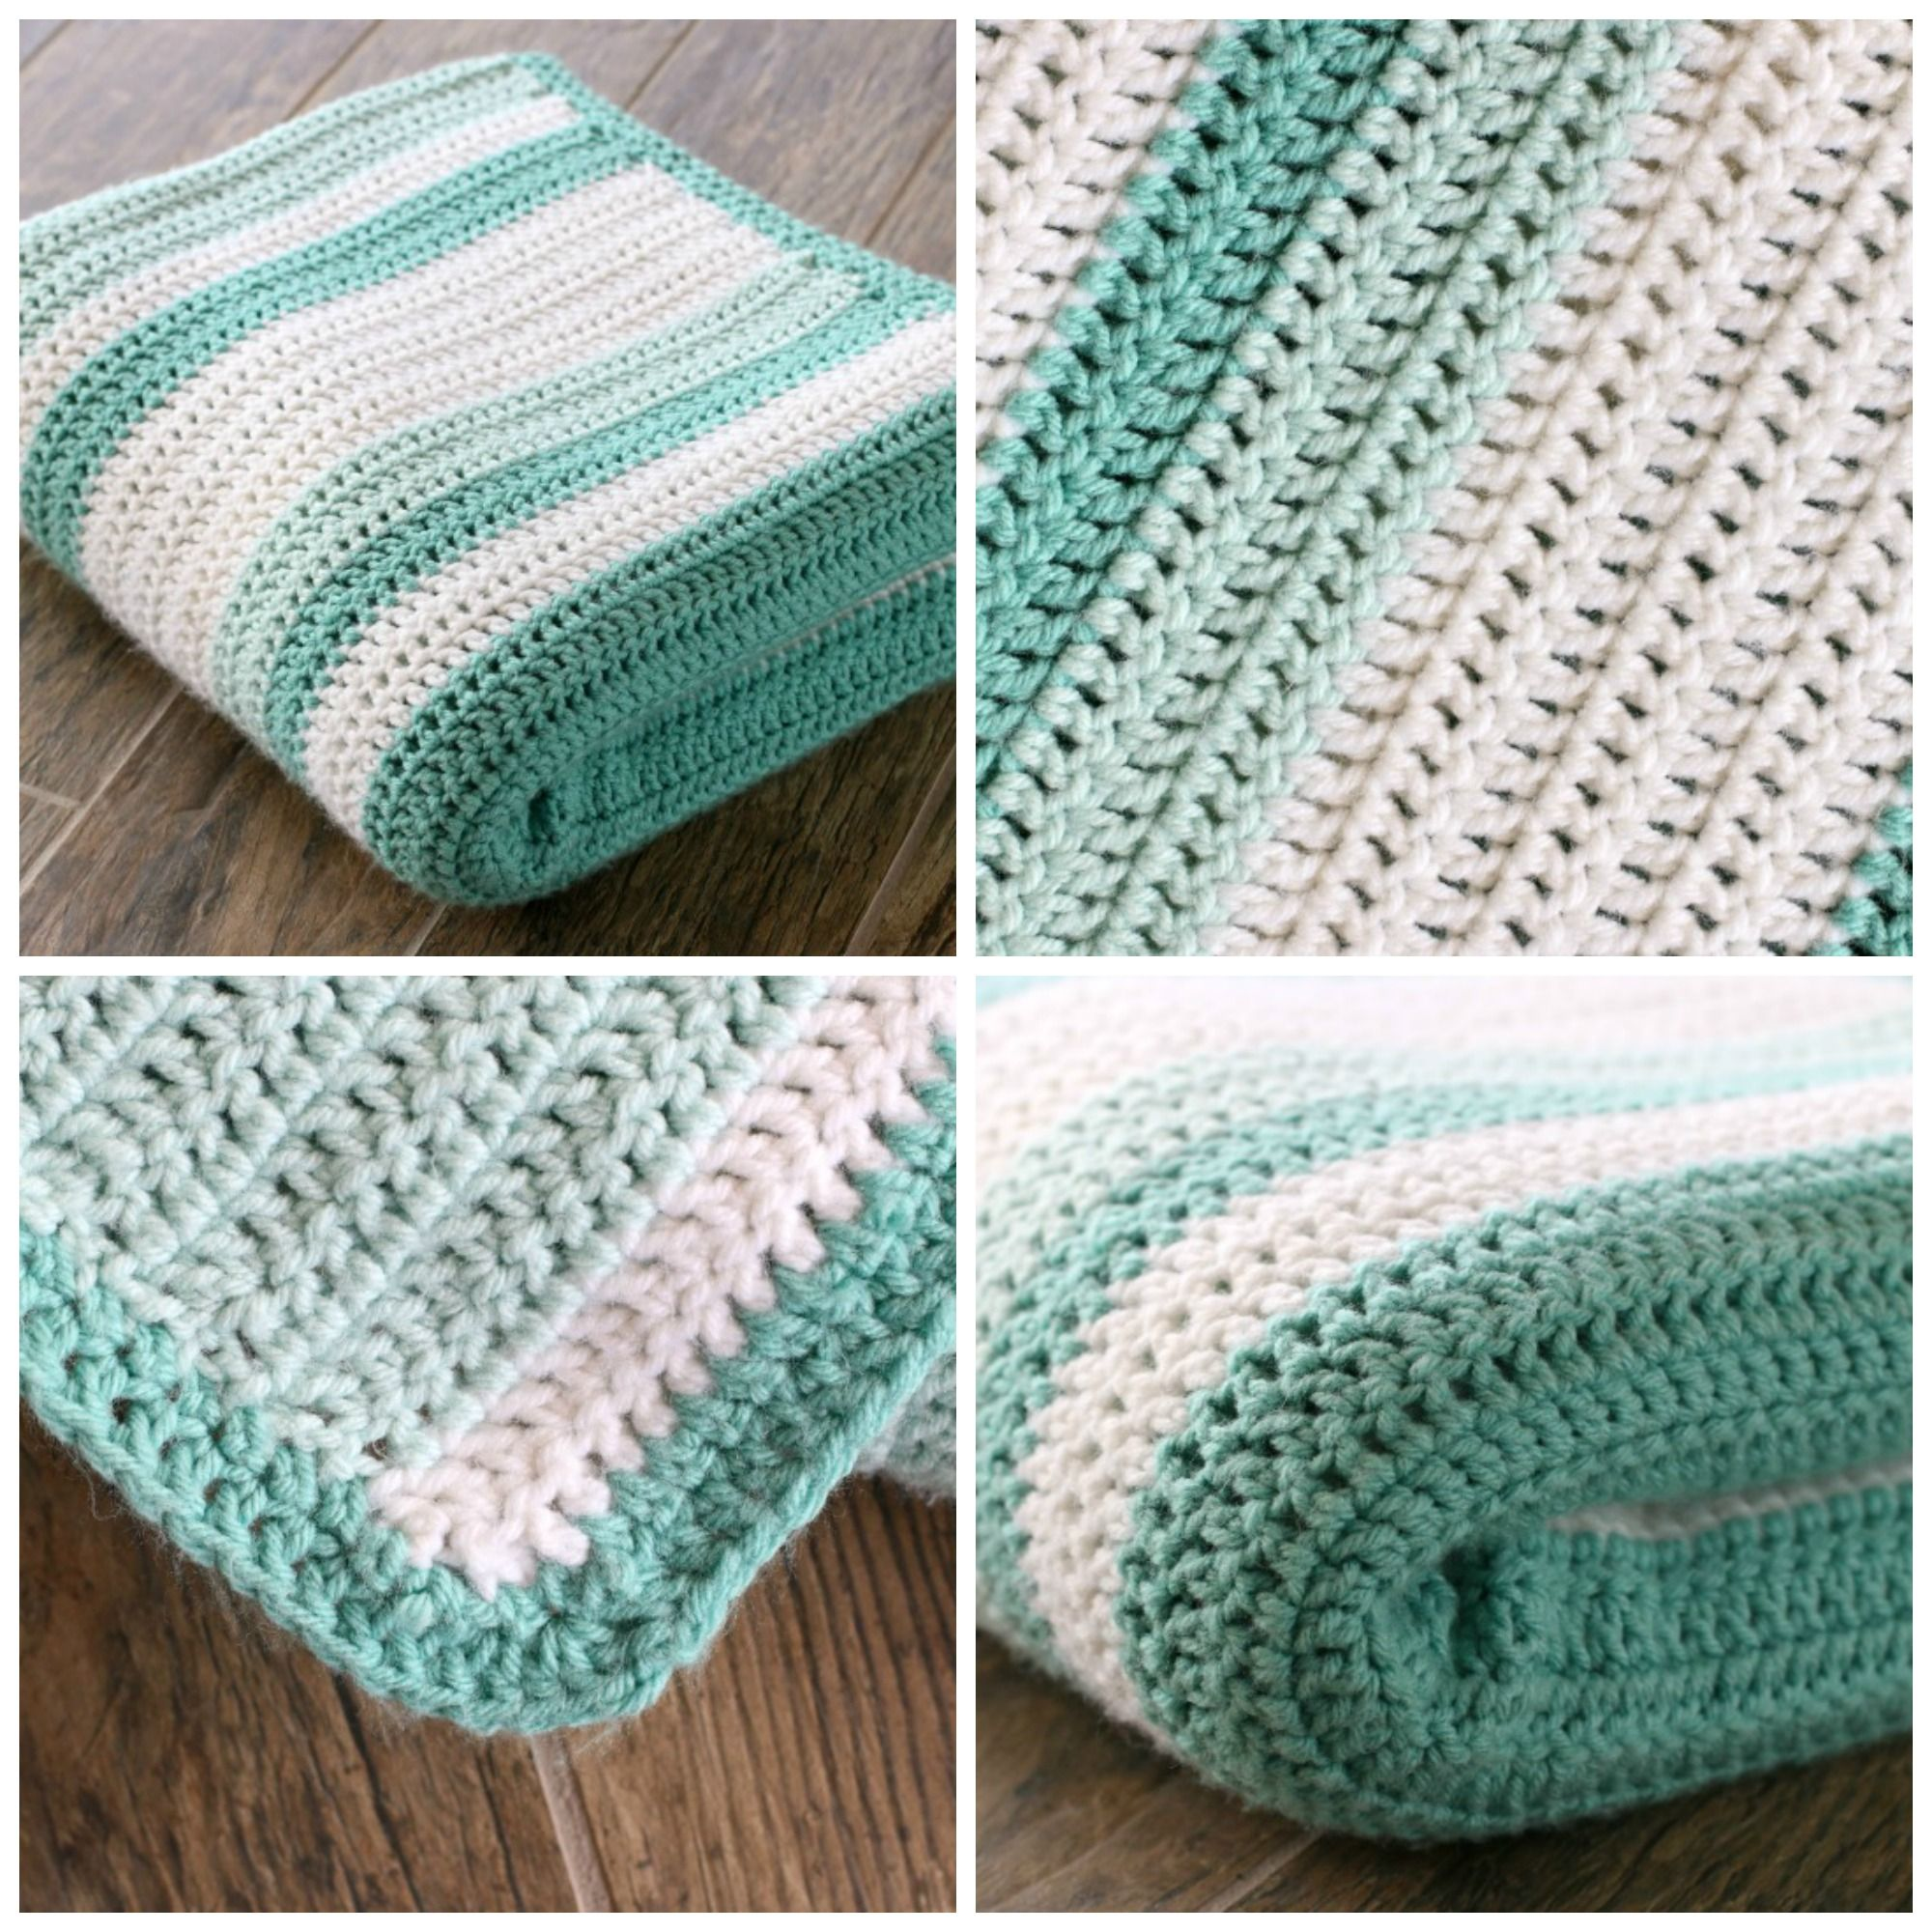 double crochet afghan tutorial